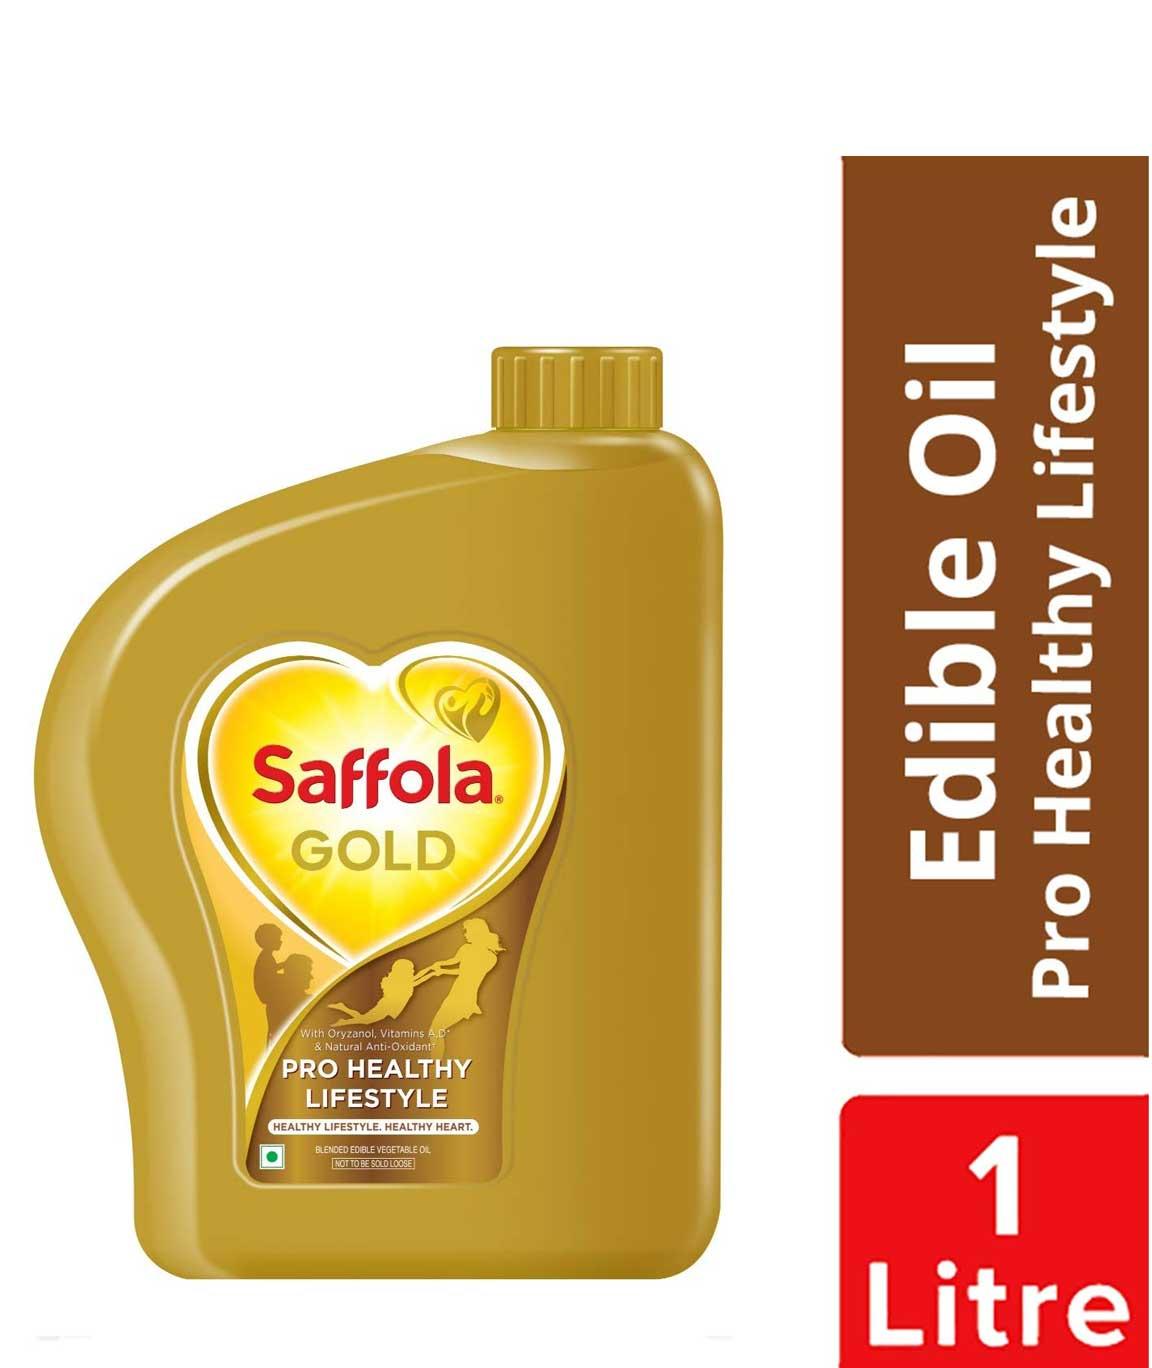 Saffola Gold, Pro Healthy Lifestyle Edible Oil, Jar, 1 L